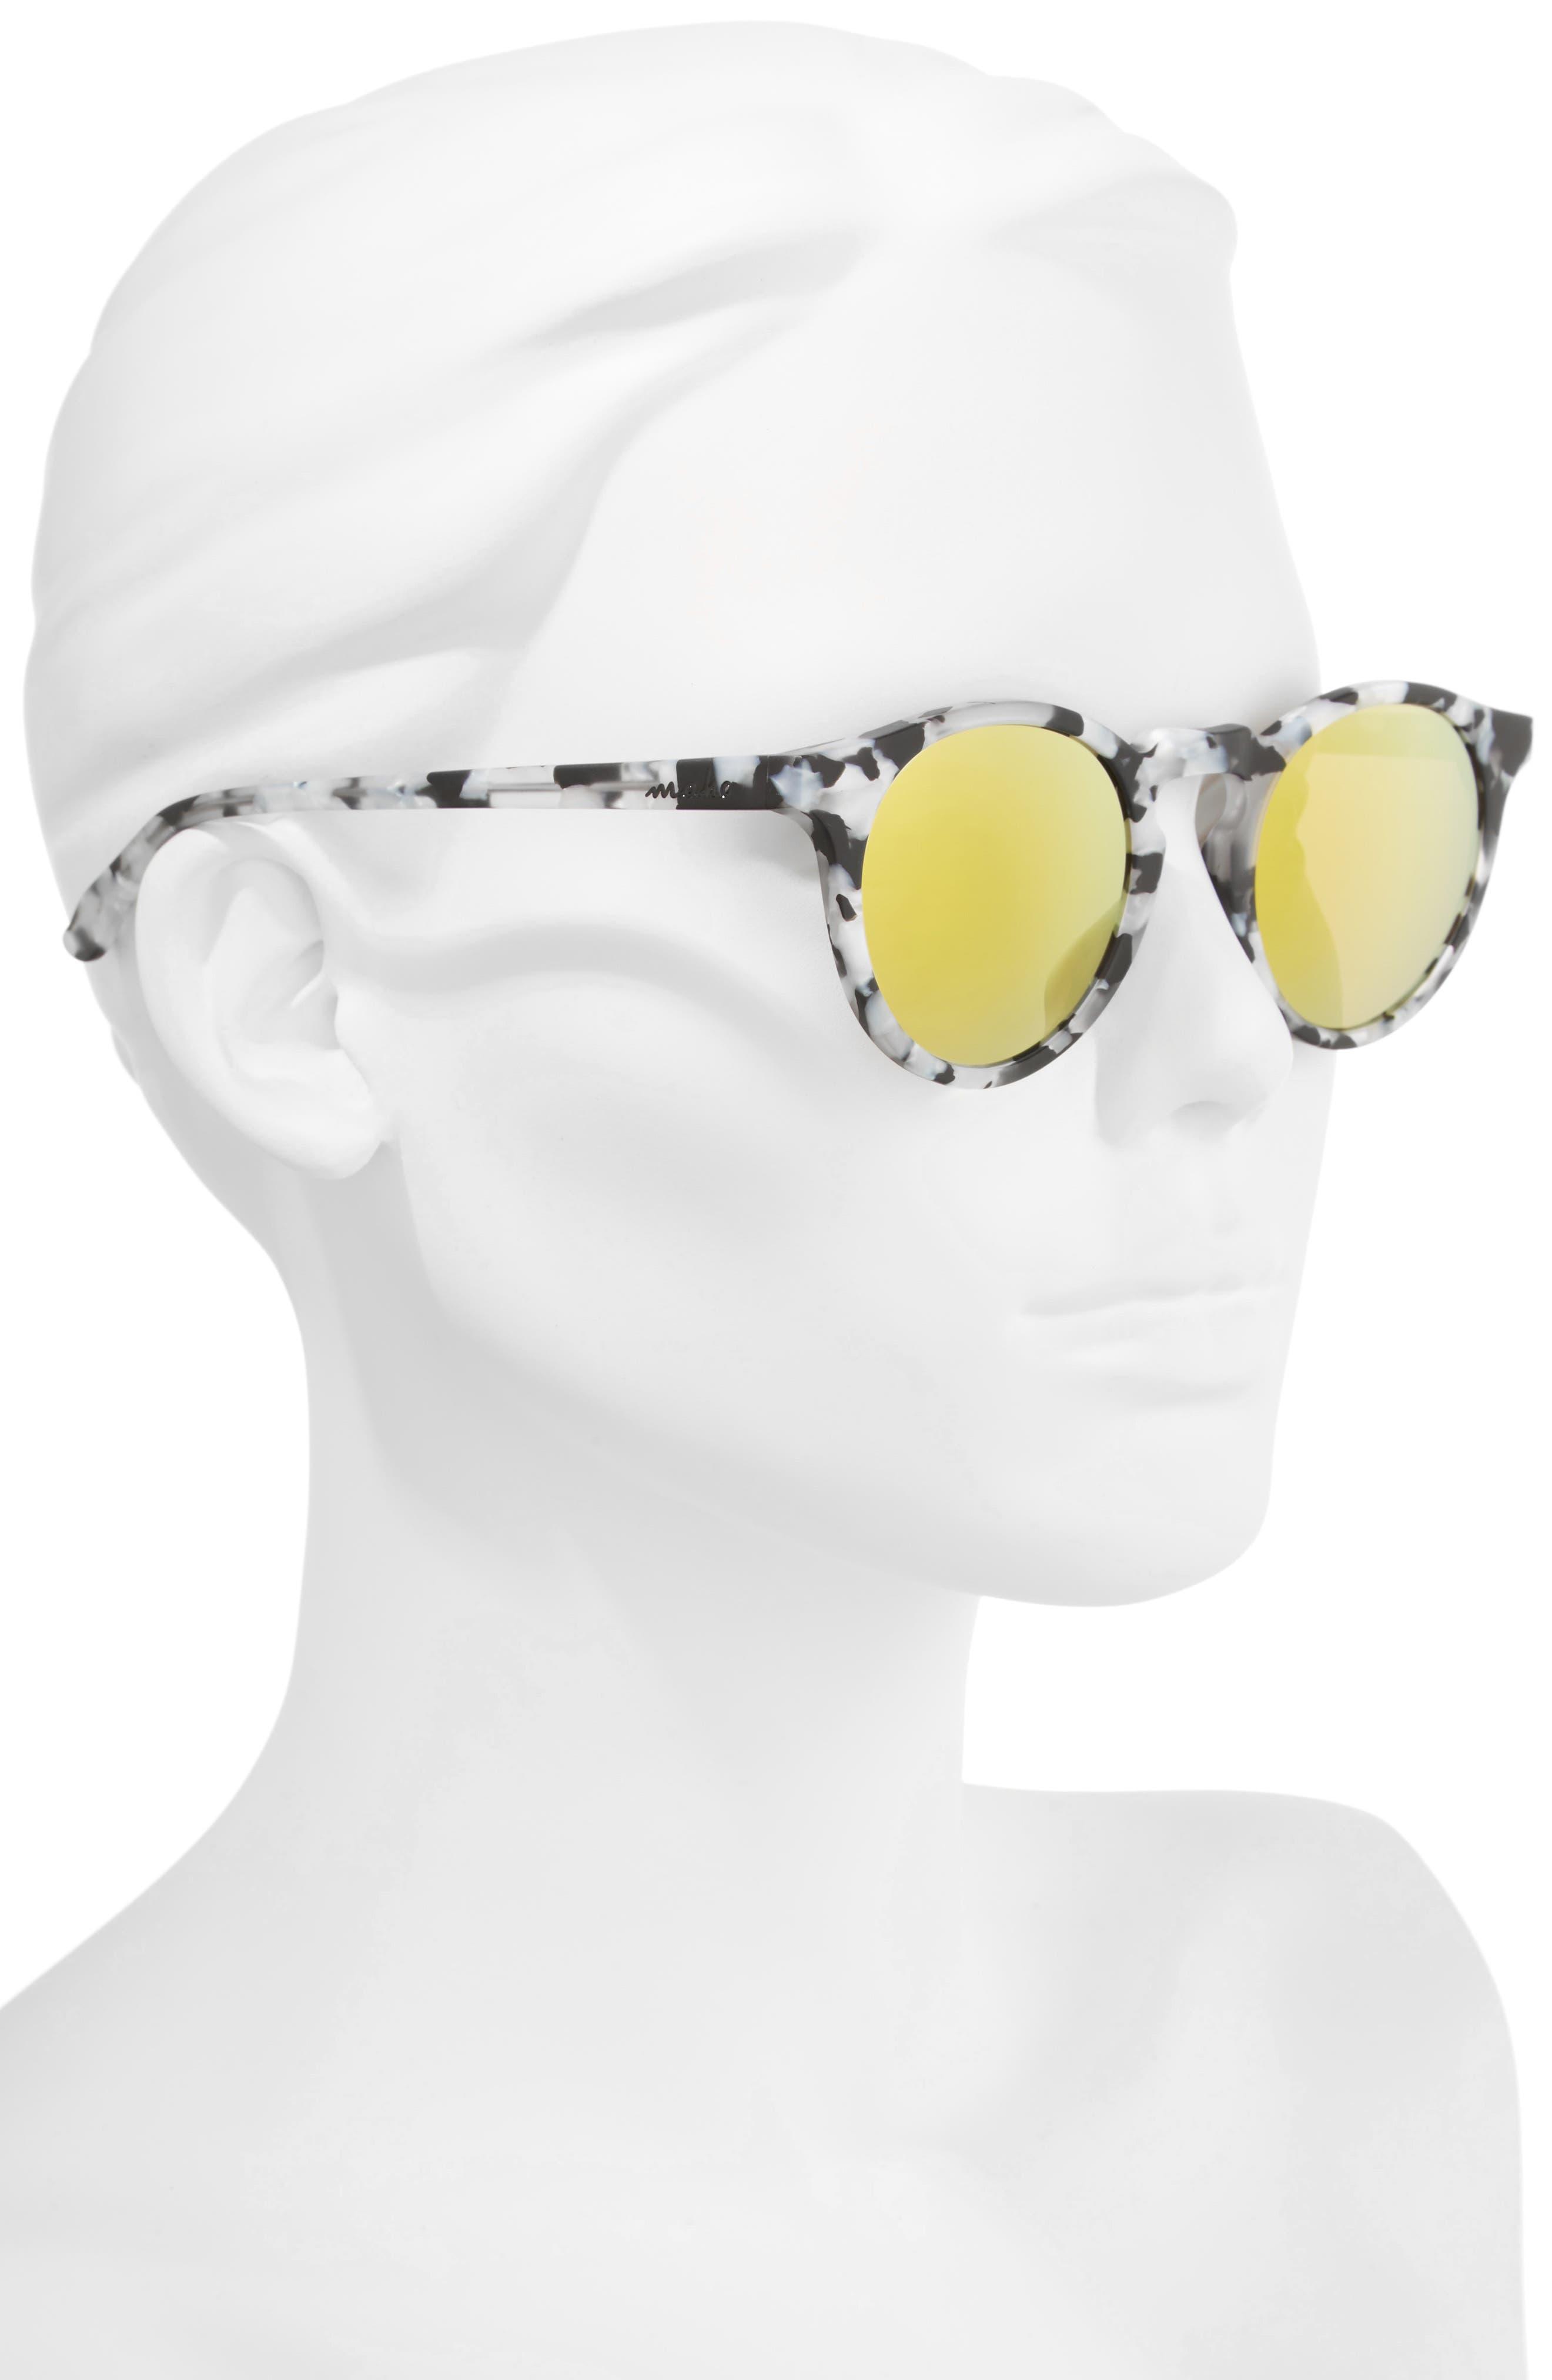 Stockholm 48mm Polarized Round Sunglasses,                             Alternate thumbnail 2, color,                             Marble